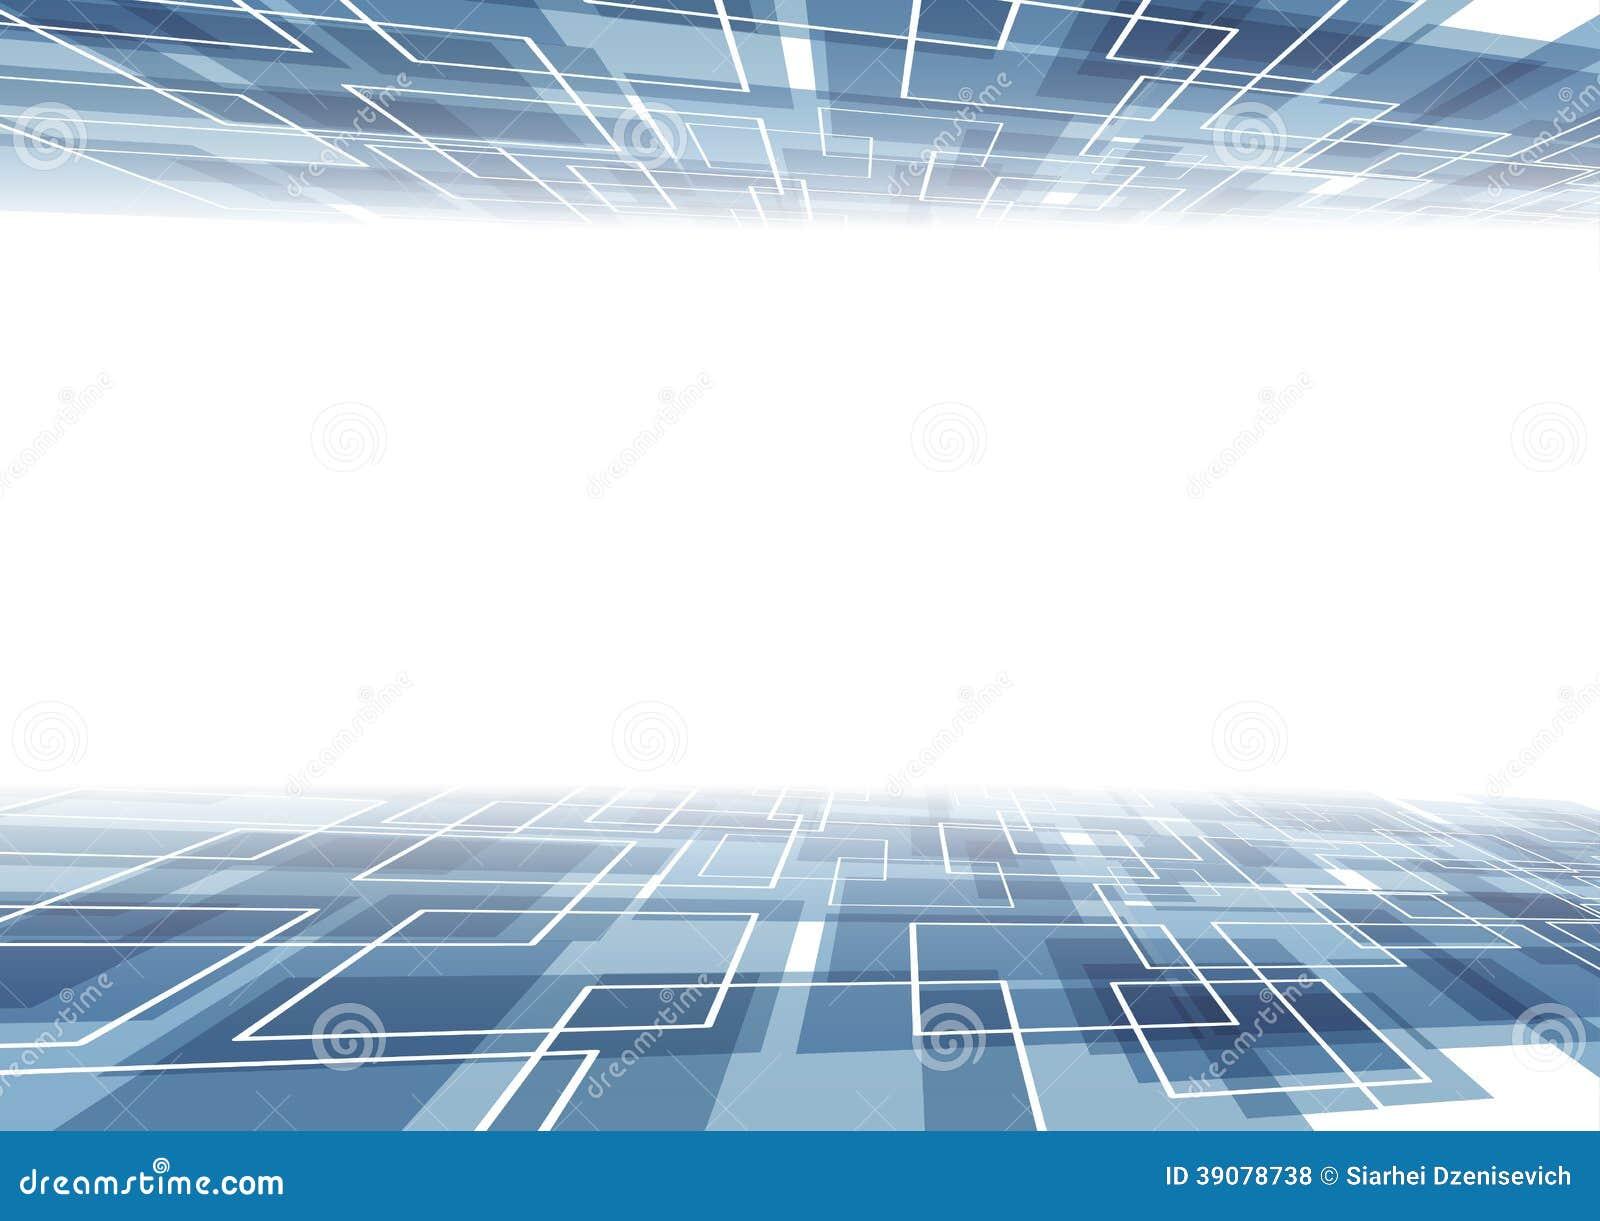 dark blue tile background stock vector illustration of card 39078738